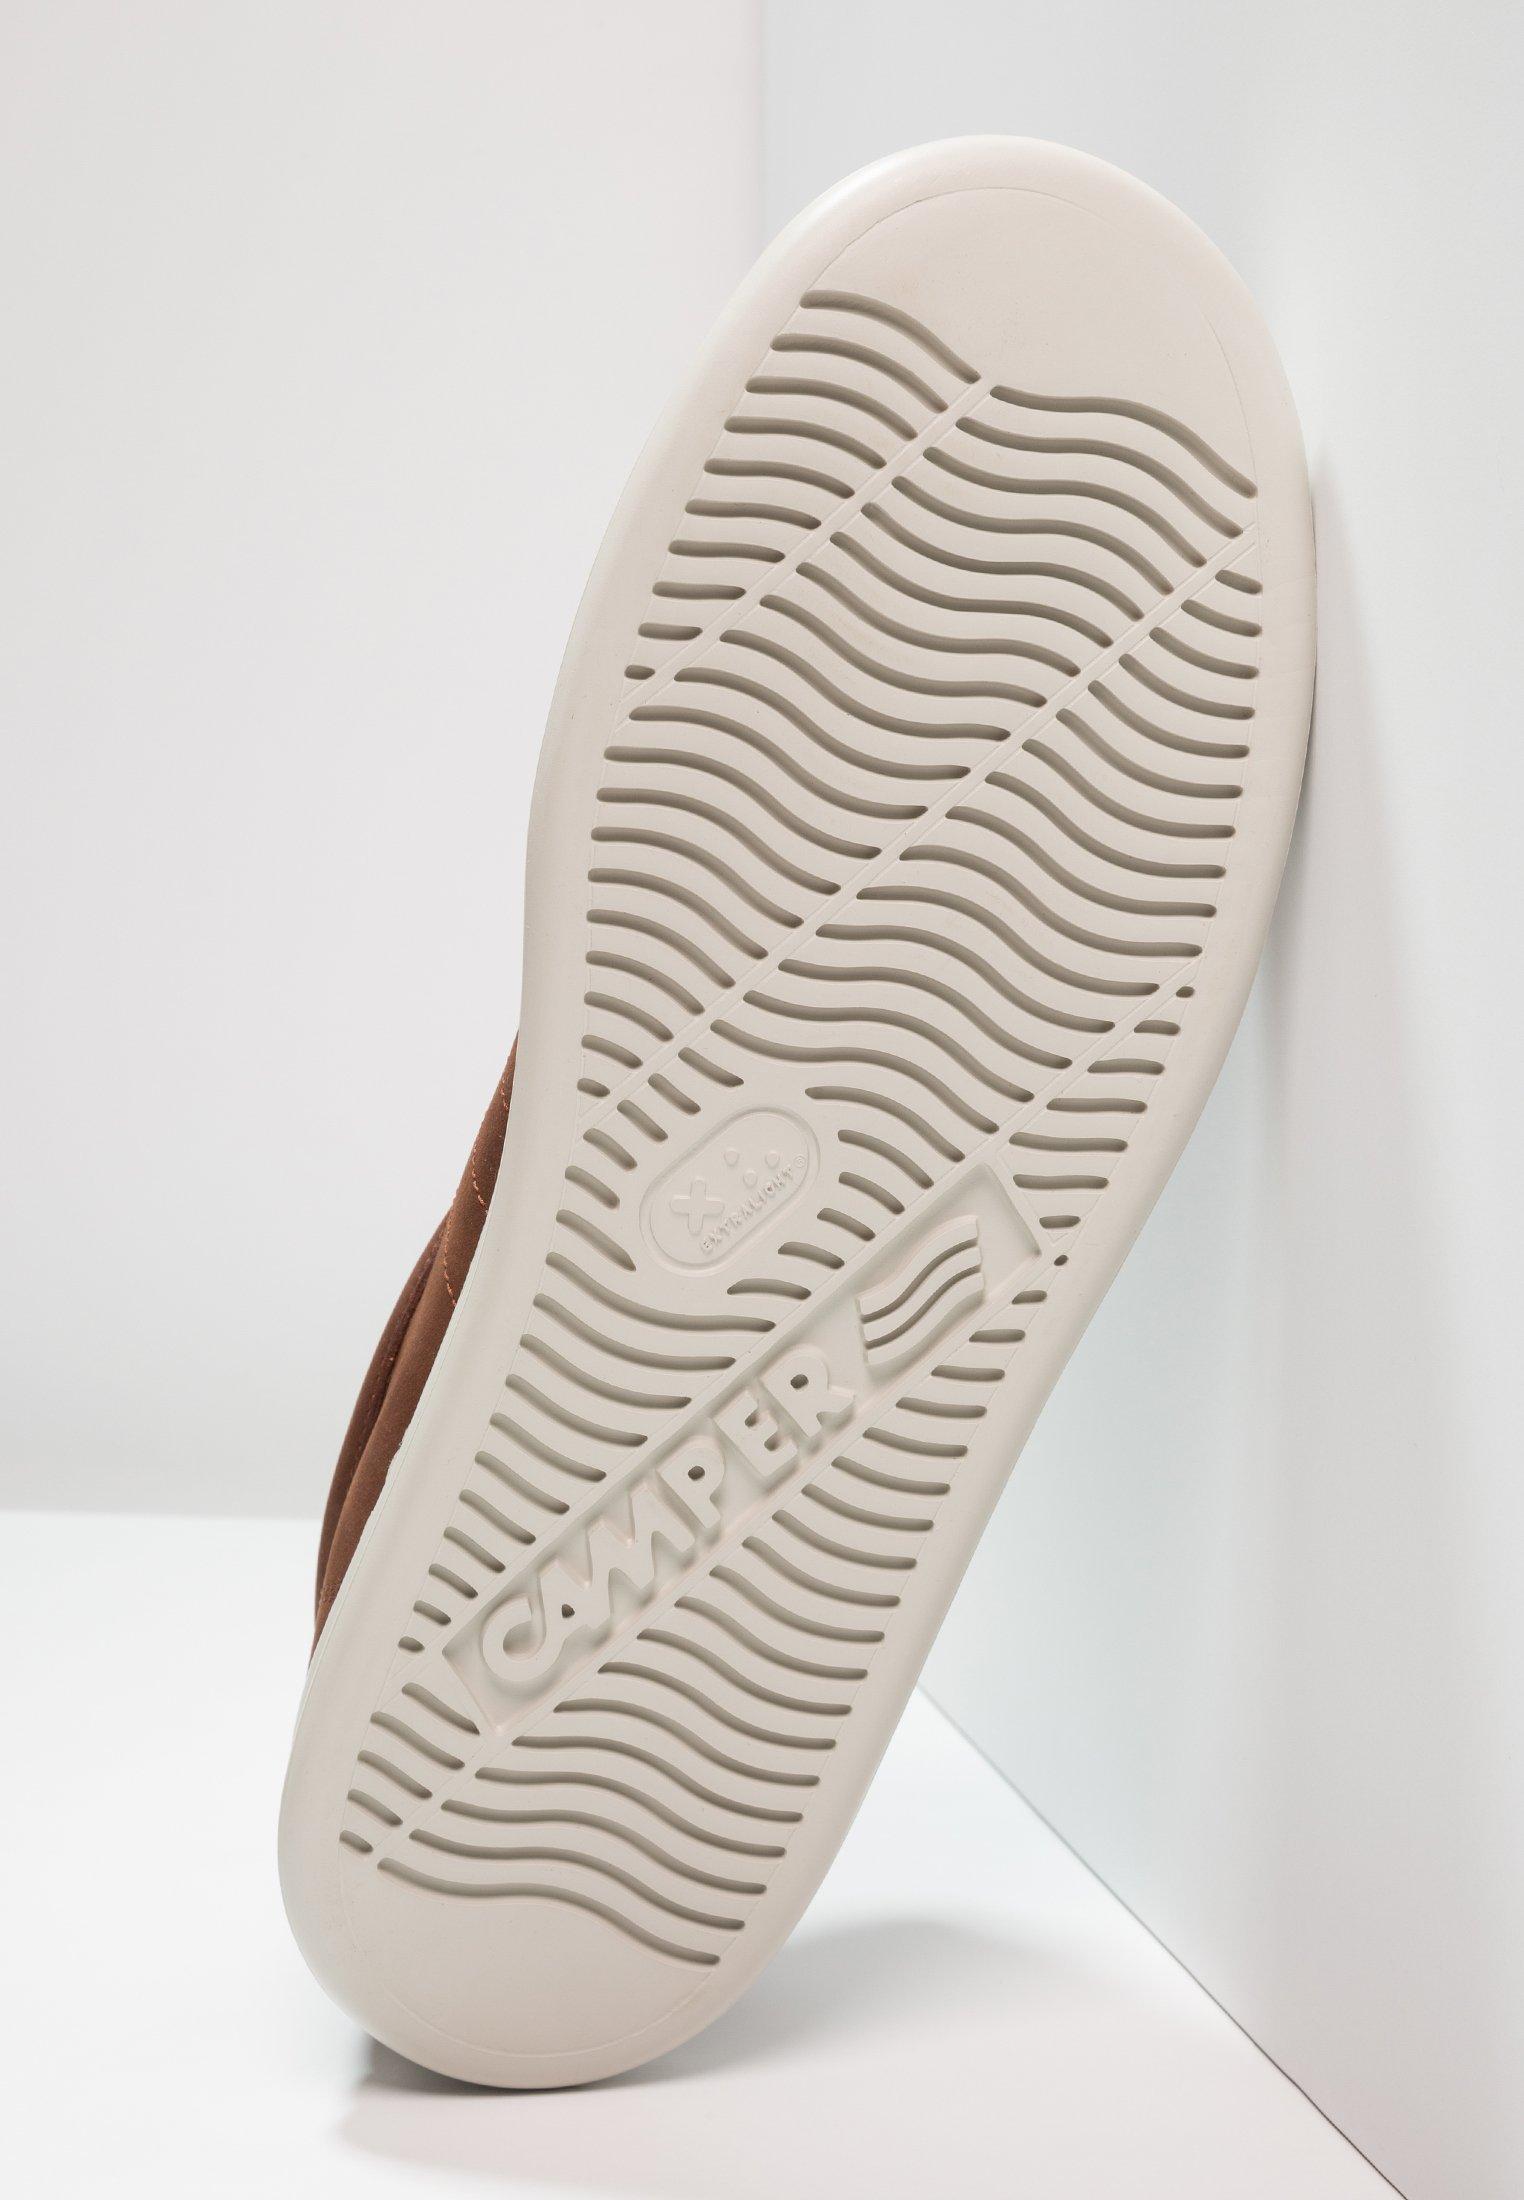 Camper RUNNER FOUR - Sneaker low - medium brown/braun - Herrenschuhe sp6O4